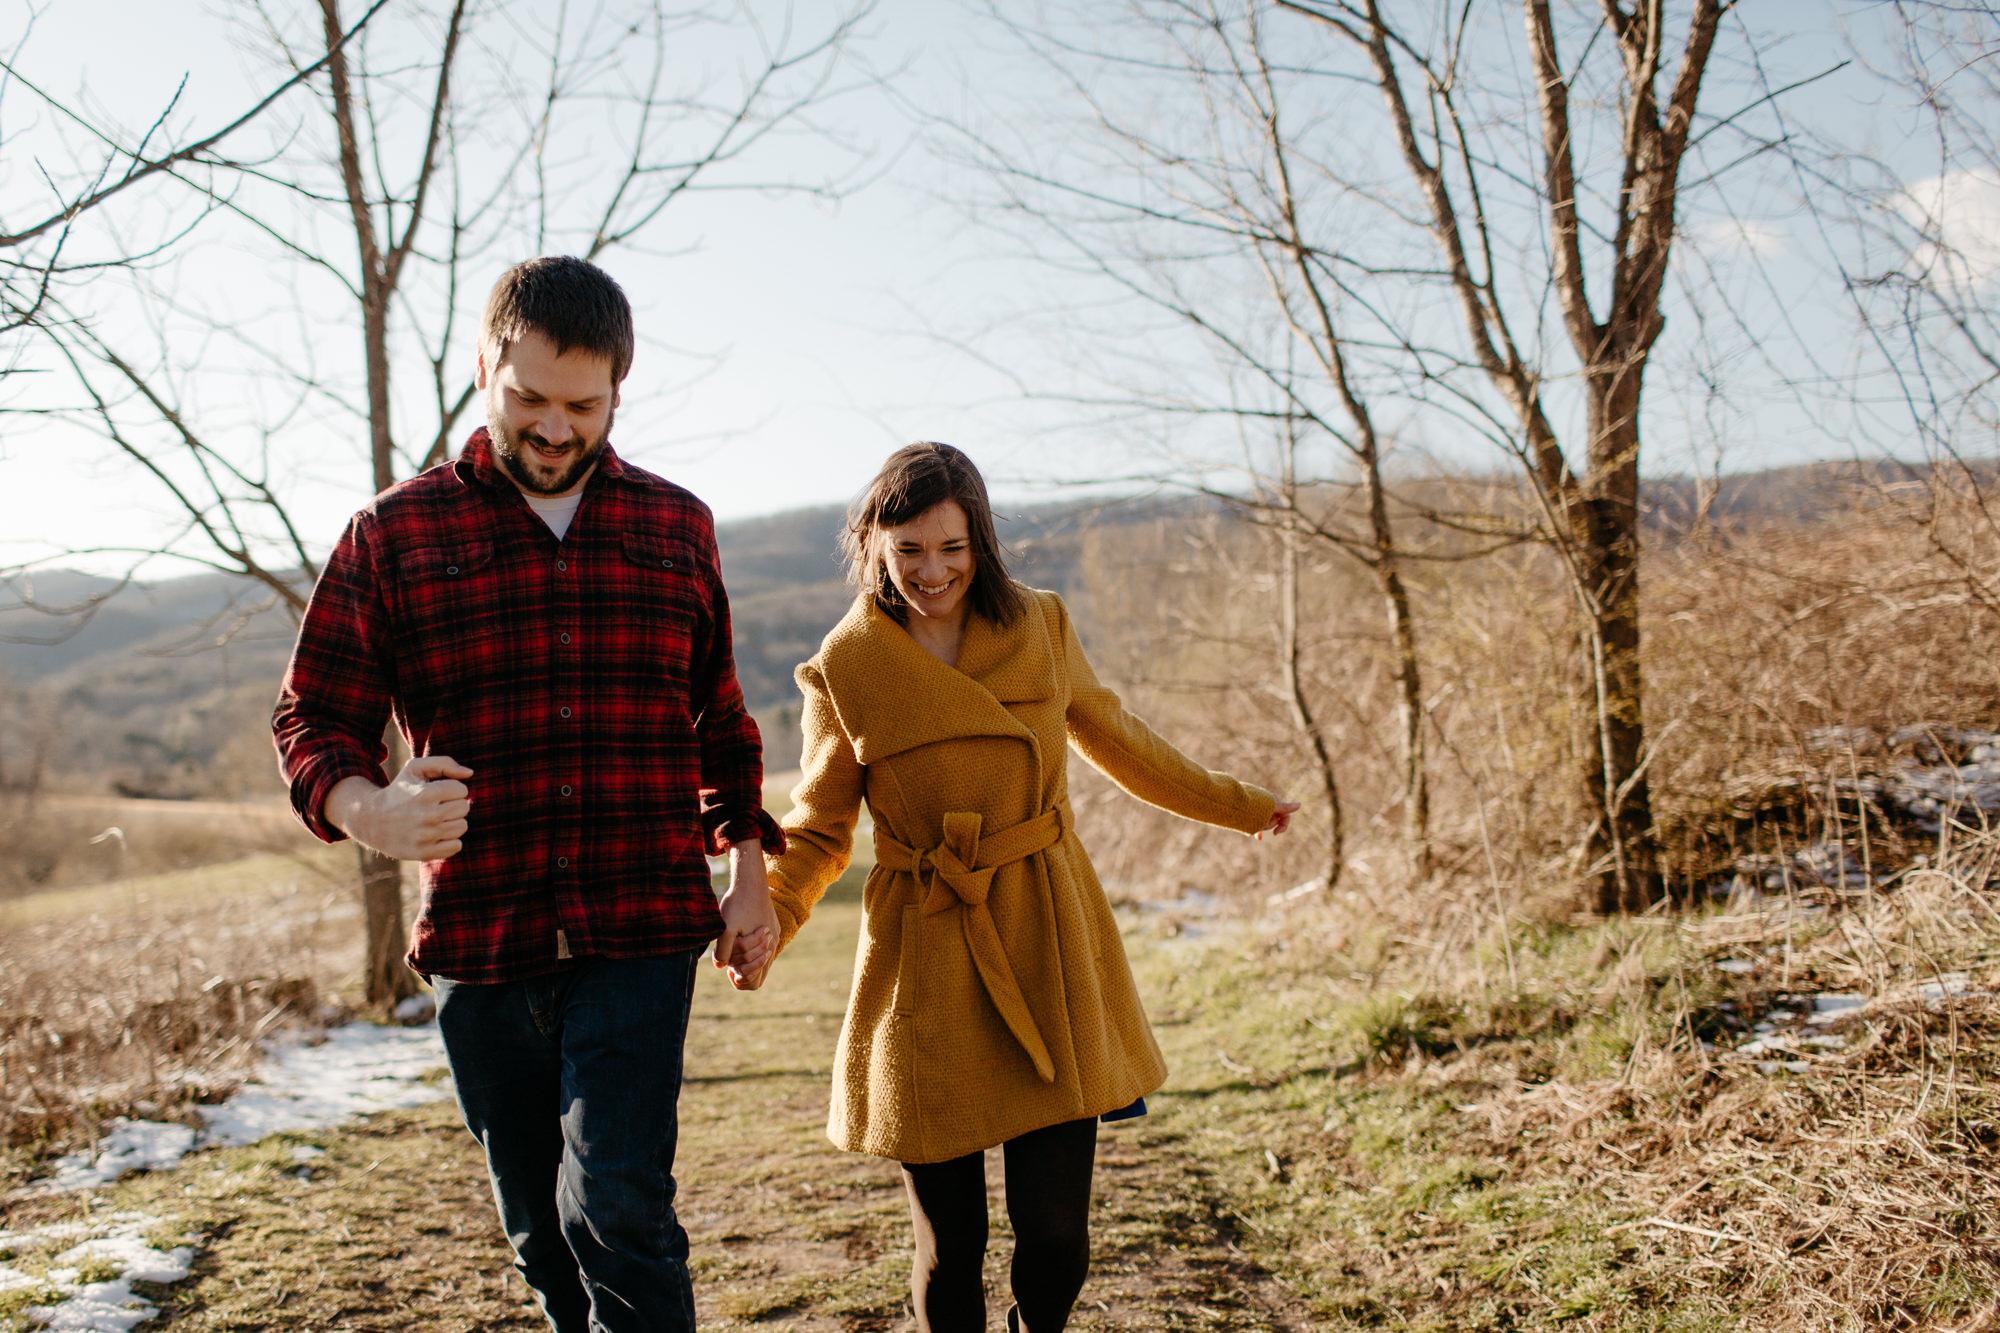 Heritage-Park-Engagement-Blacksburg-Wedding-Photographer-9.jpg